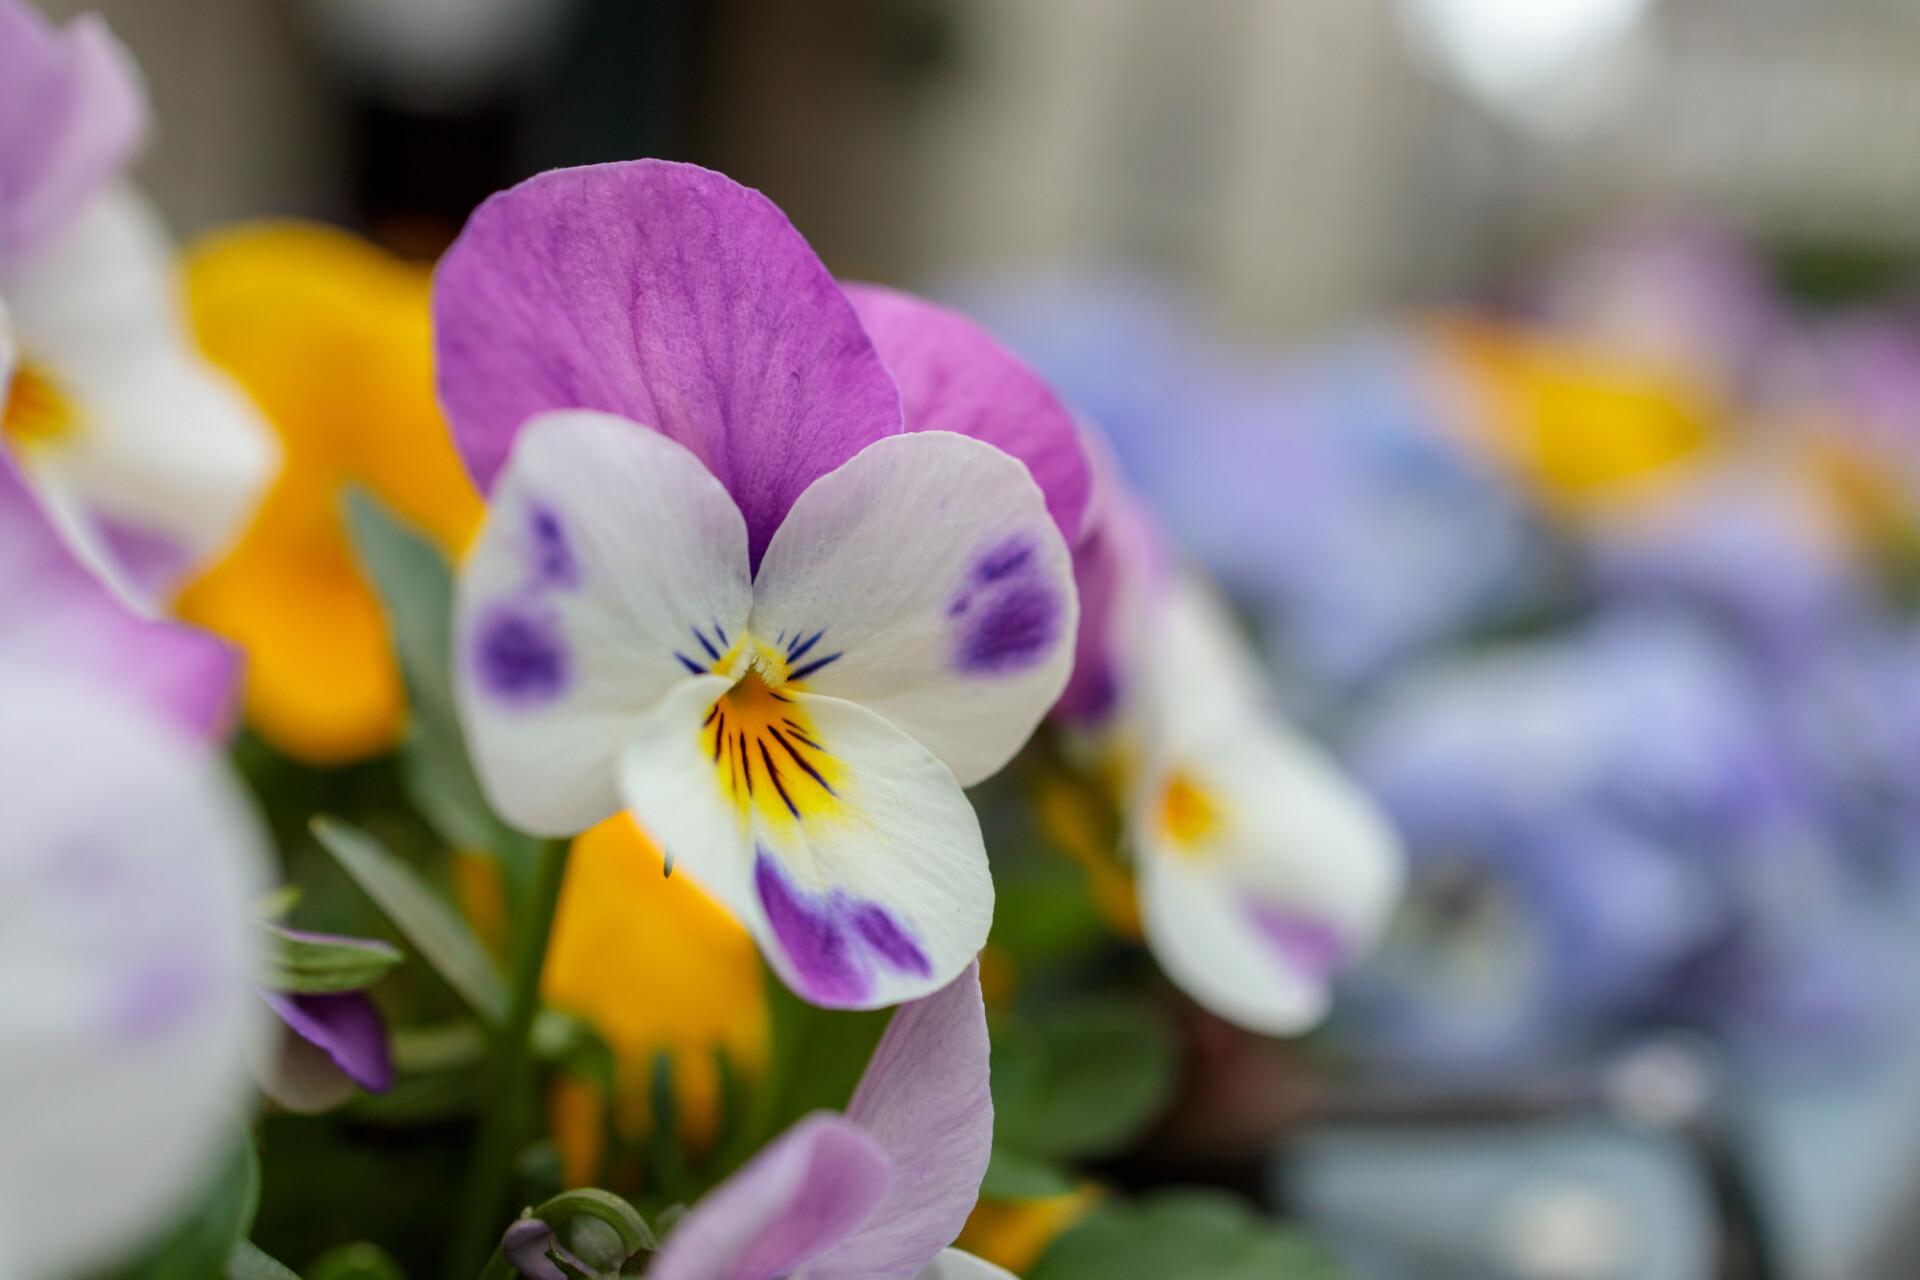 pansy flower